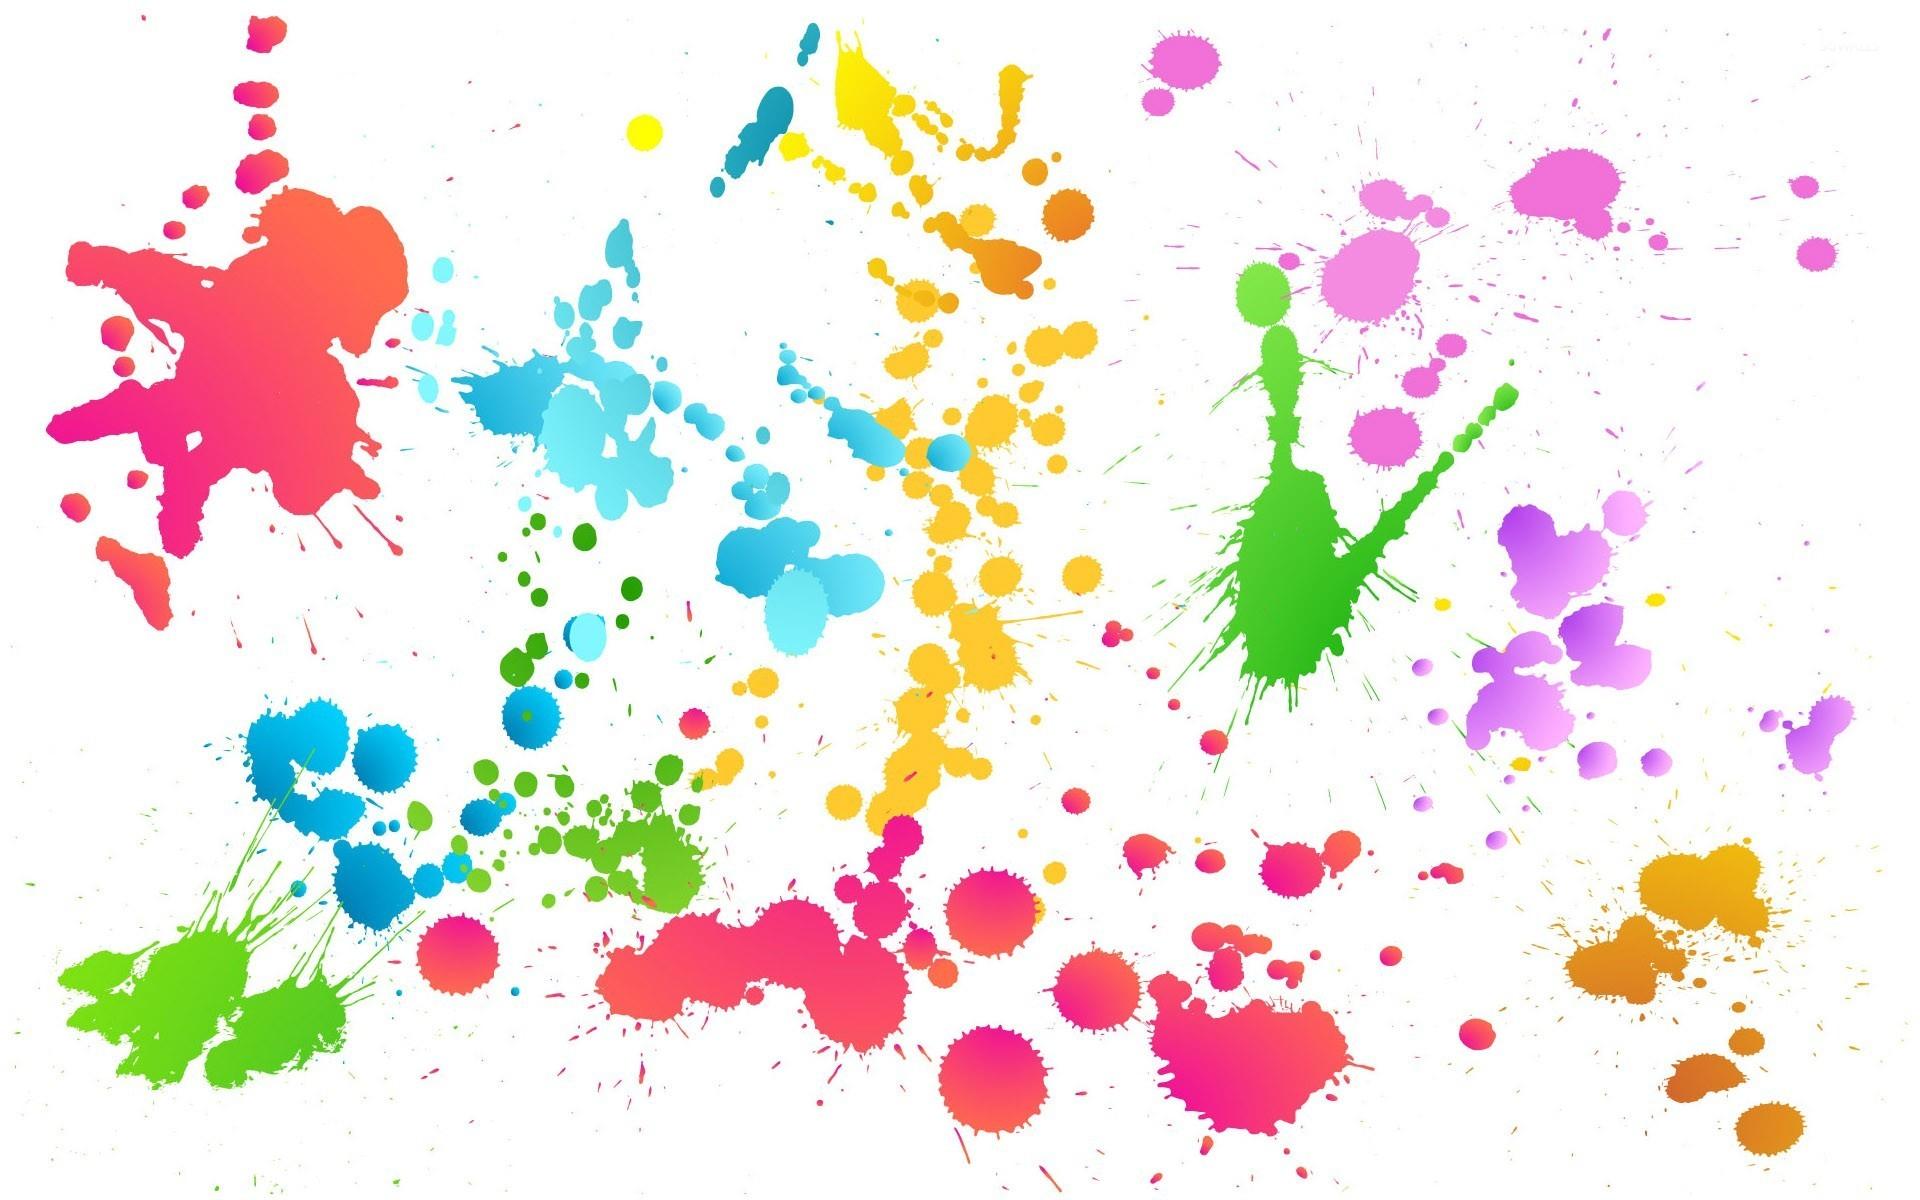 Color Splash 2 Wallpaper